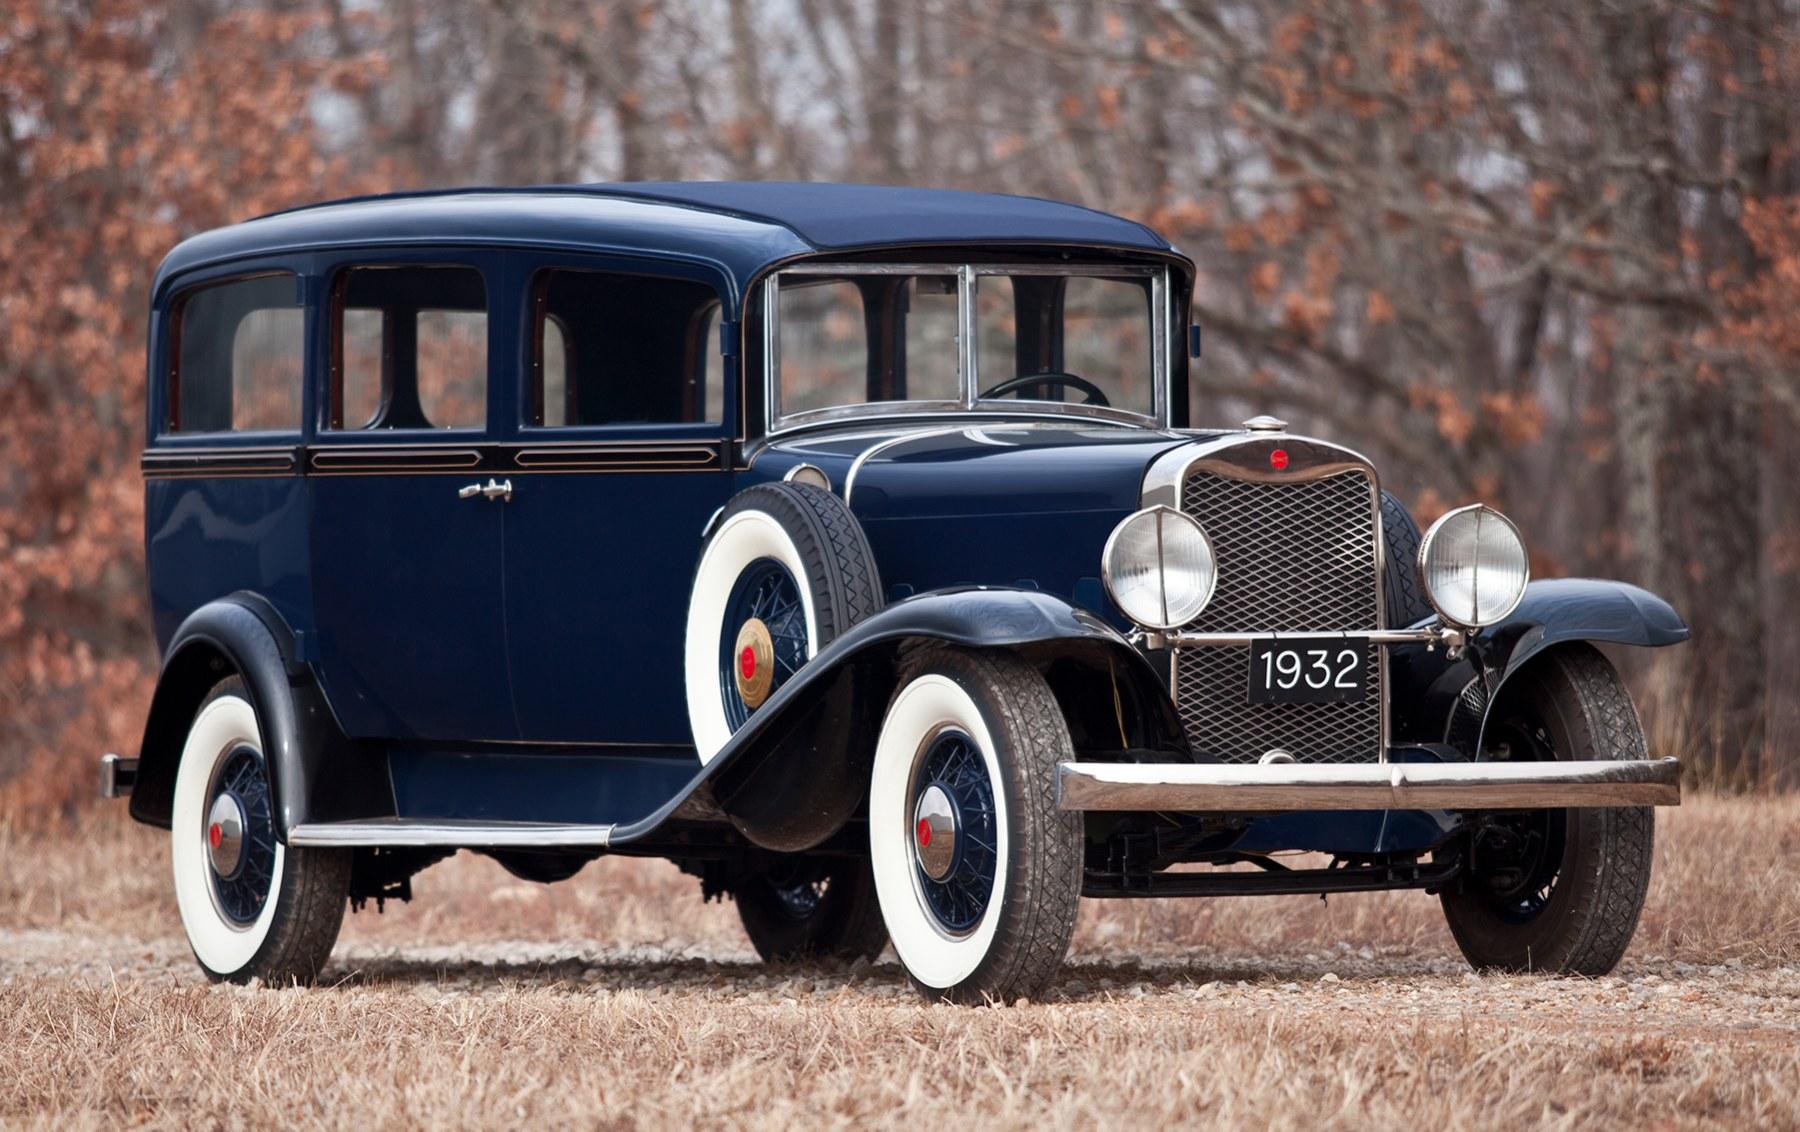 1932 Henney Model 10 Hearse